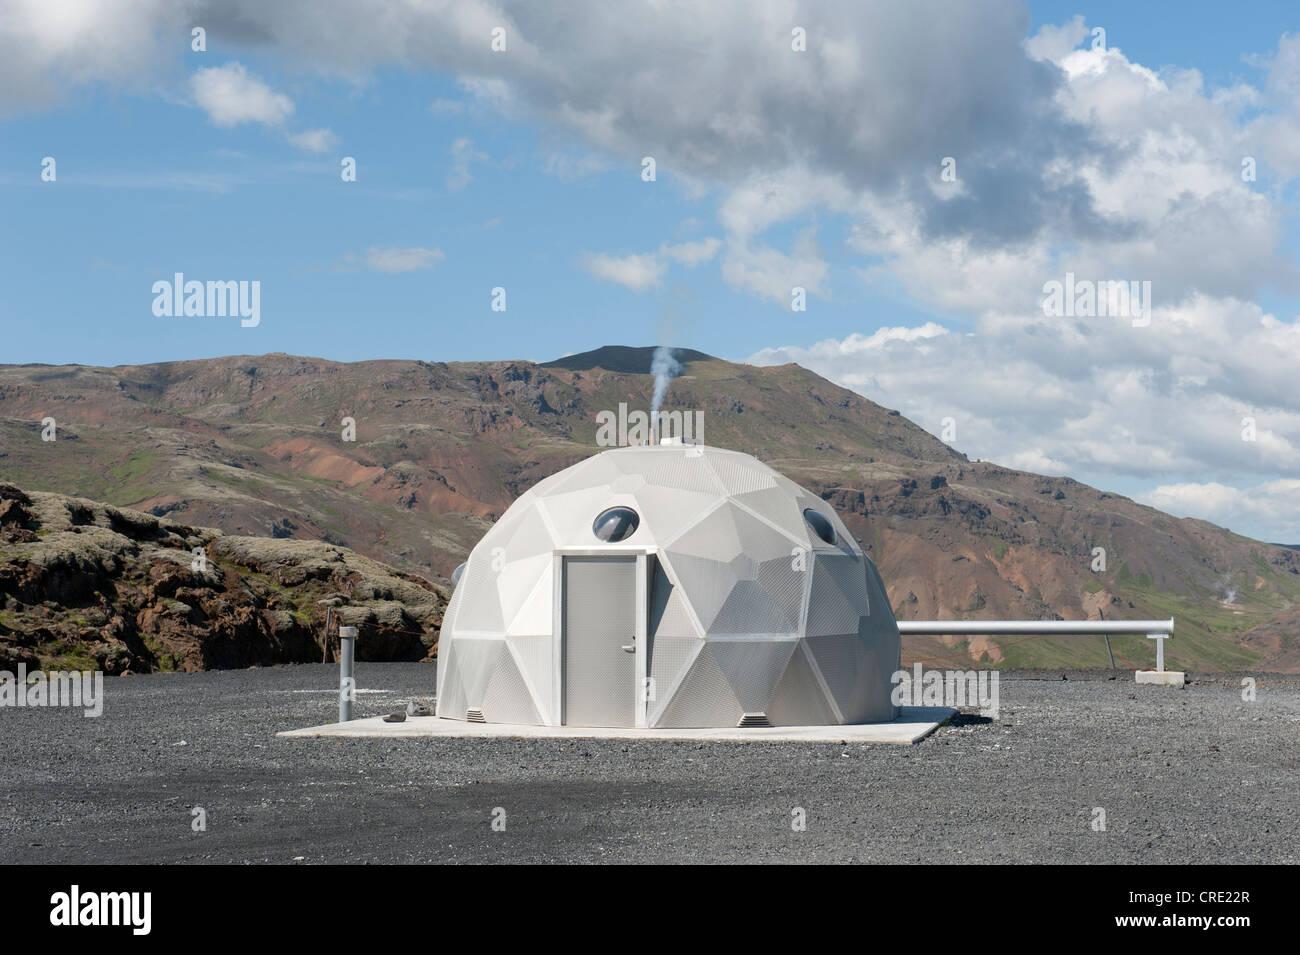 Futuristic house, geothermal power plant, Nesjavellir power plant, Hveragerði, Hengill region, Iceland, Scandinavia - Stock Image